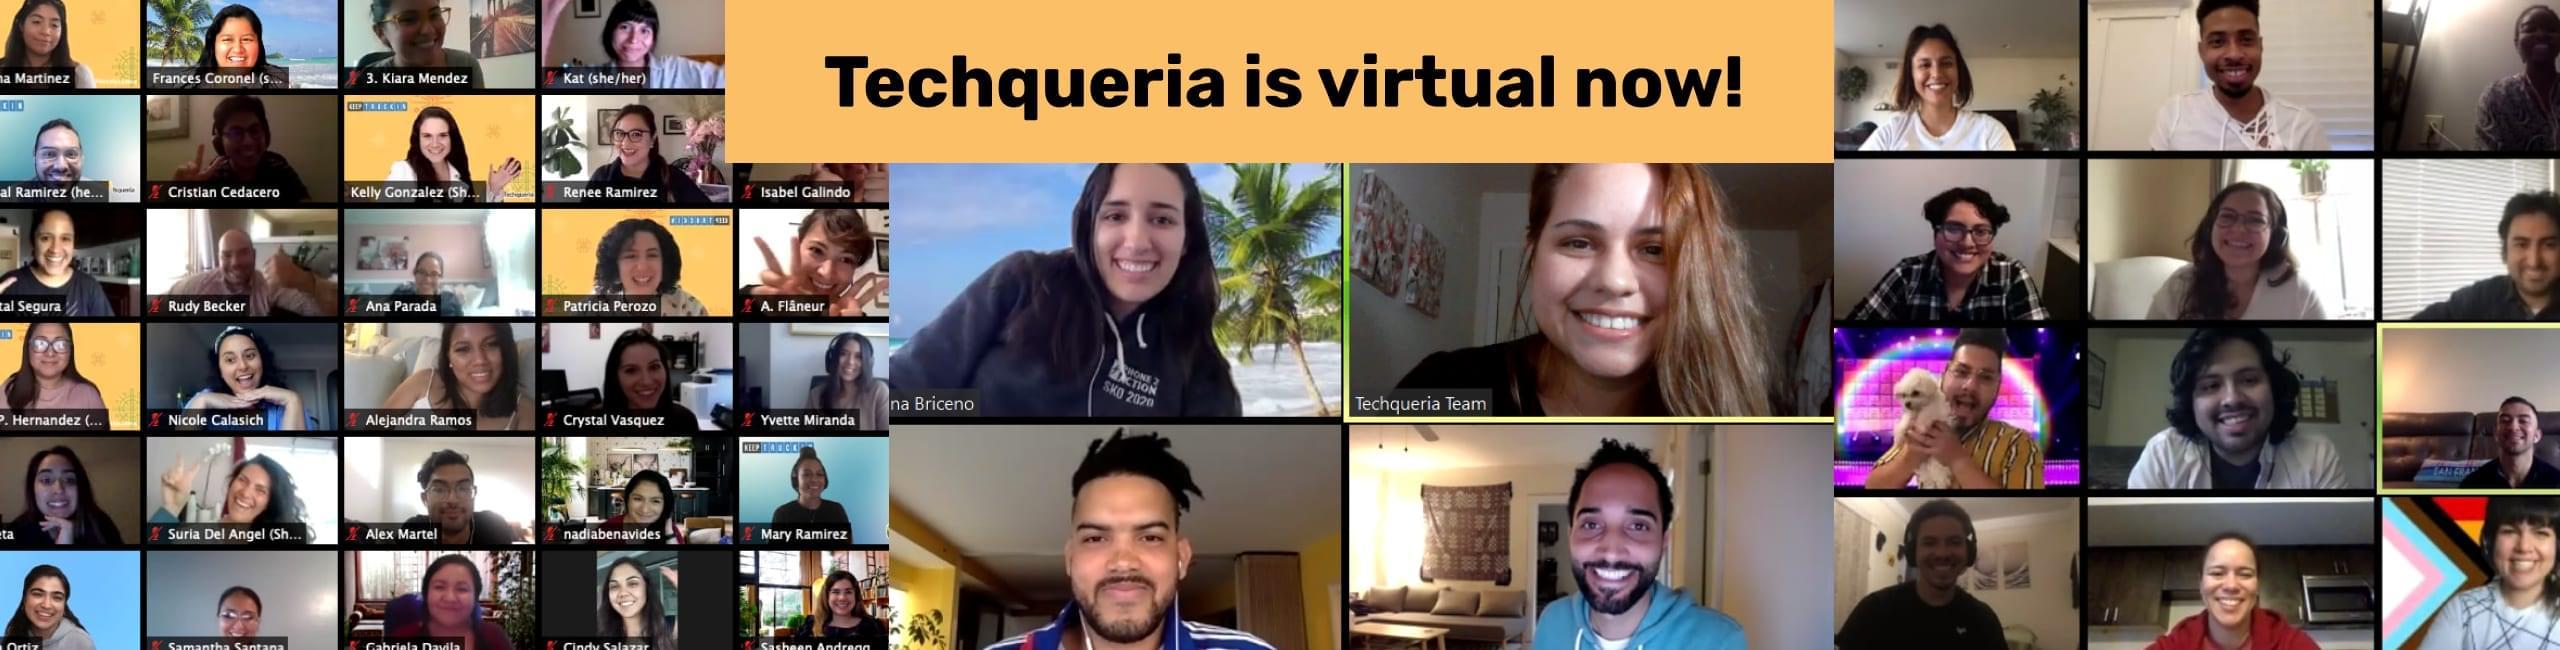 Techqueria Virtual Events